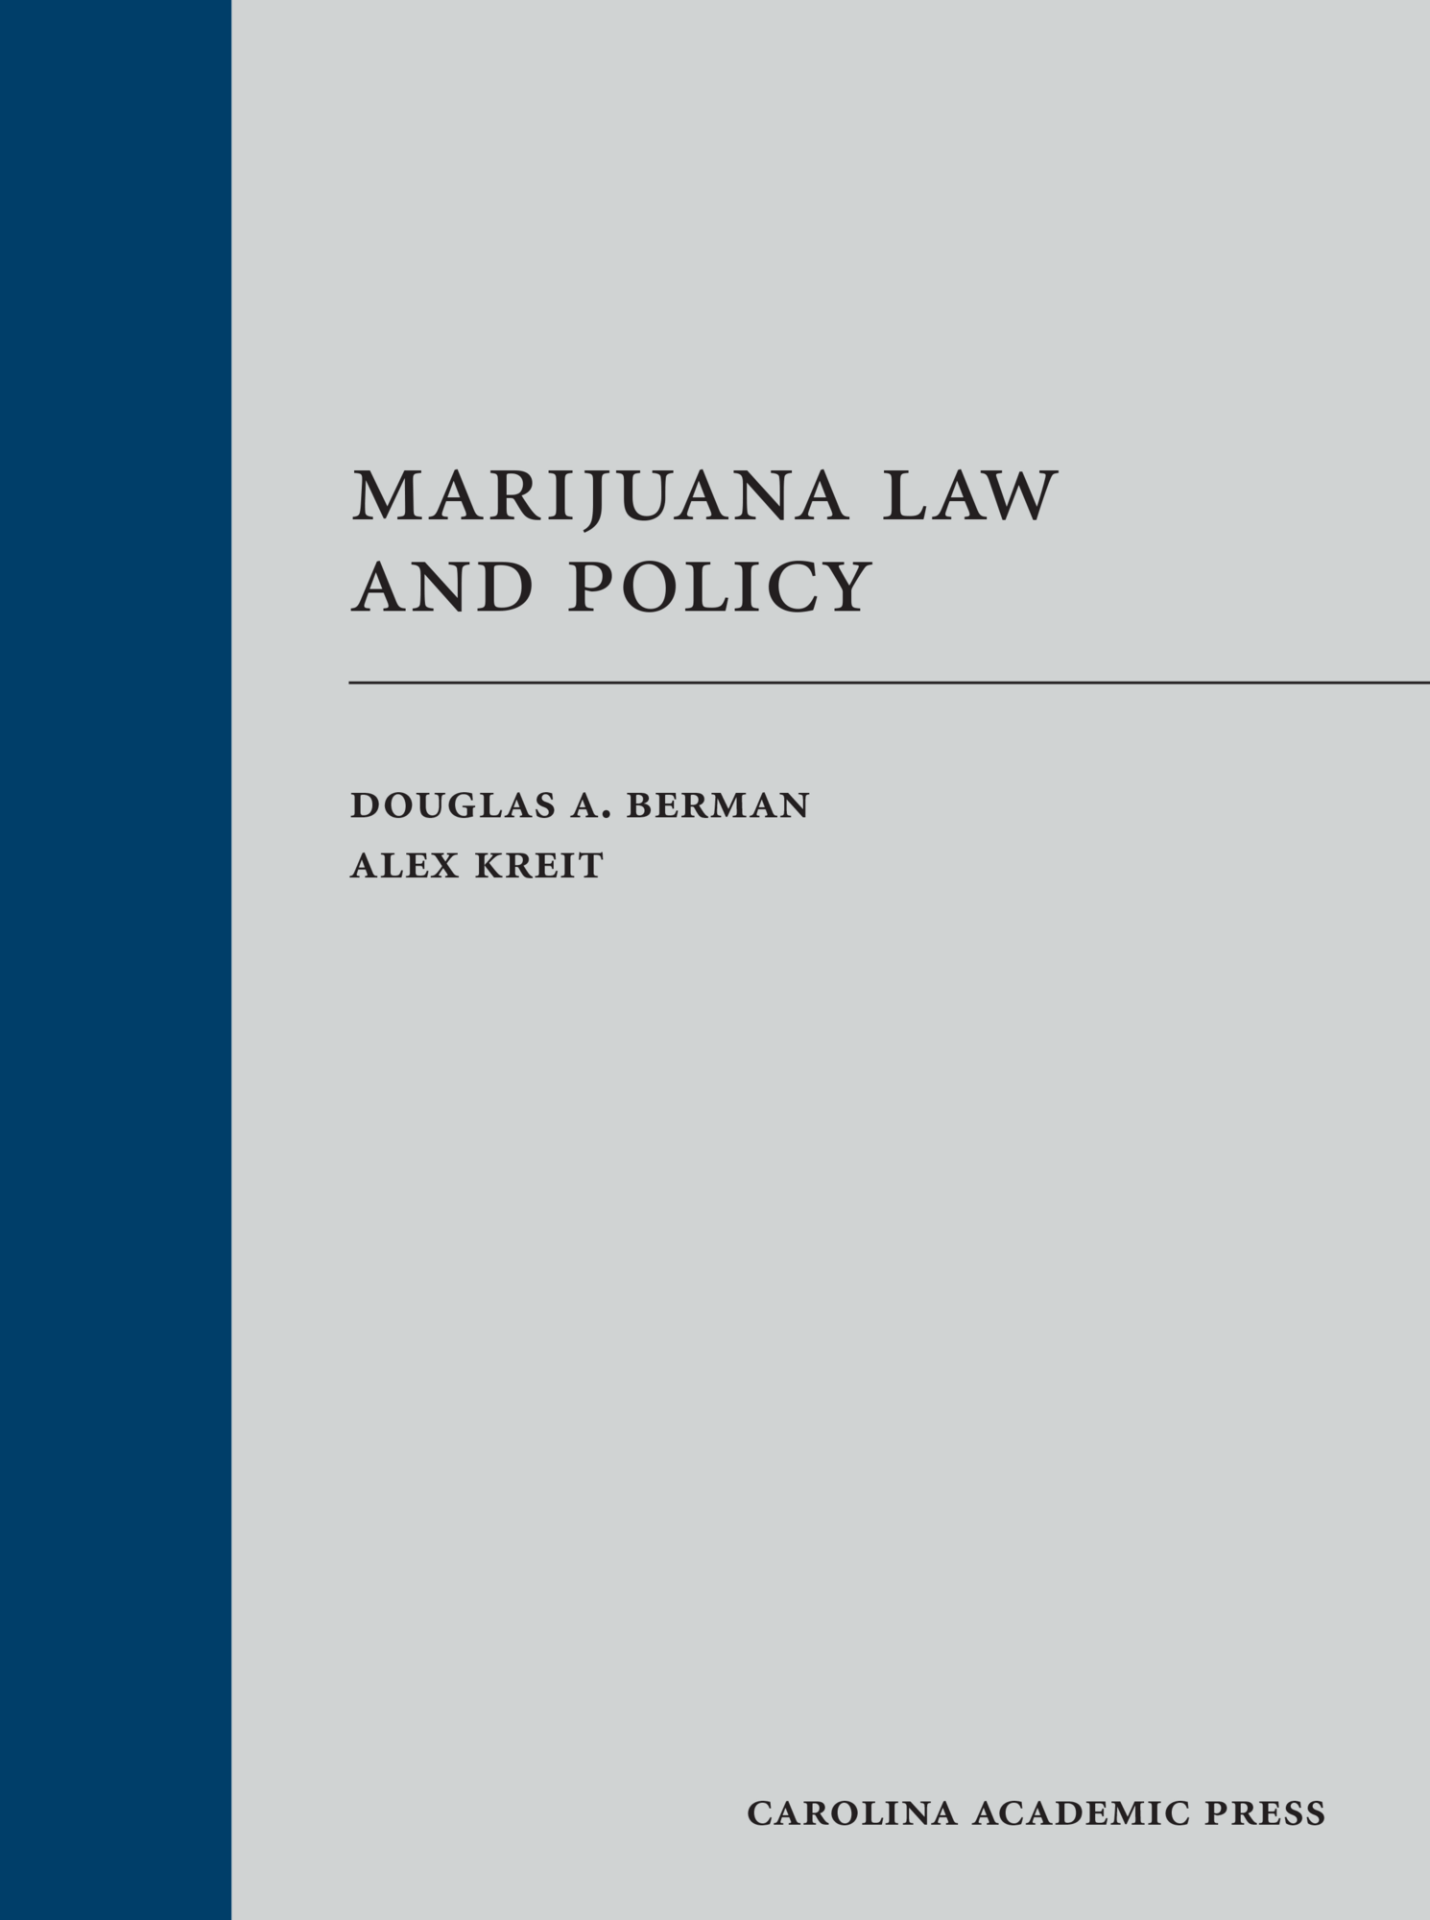 Marijuana Law and Policy